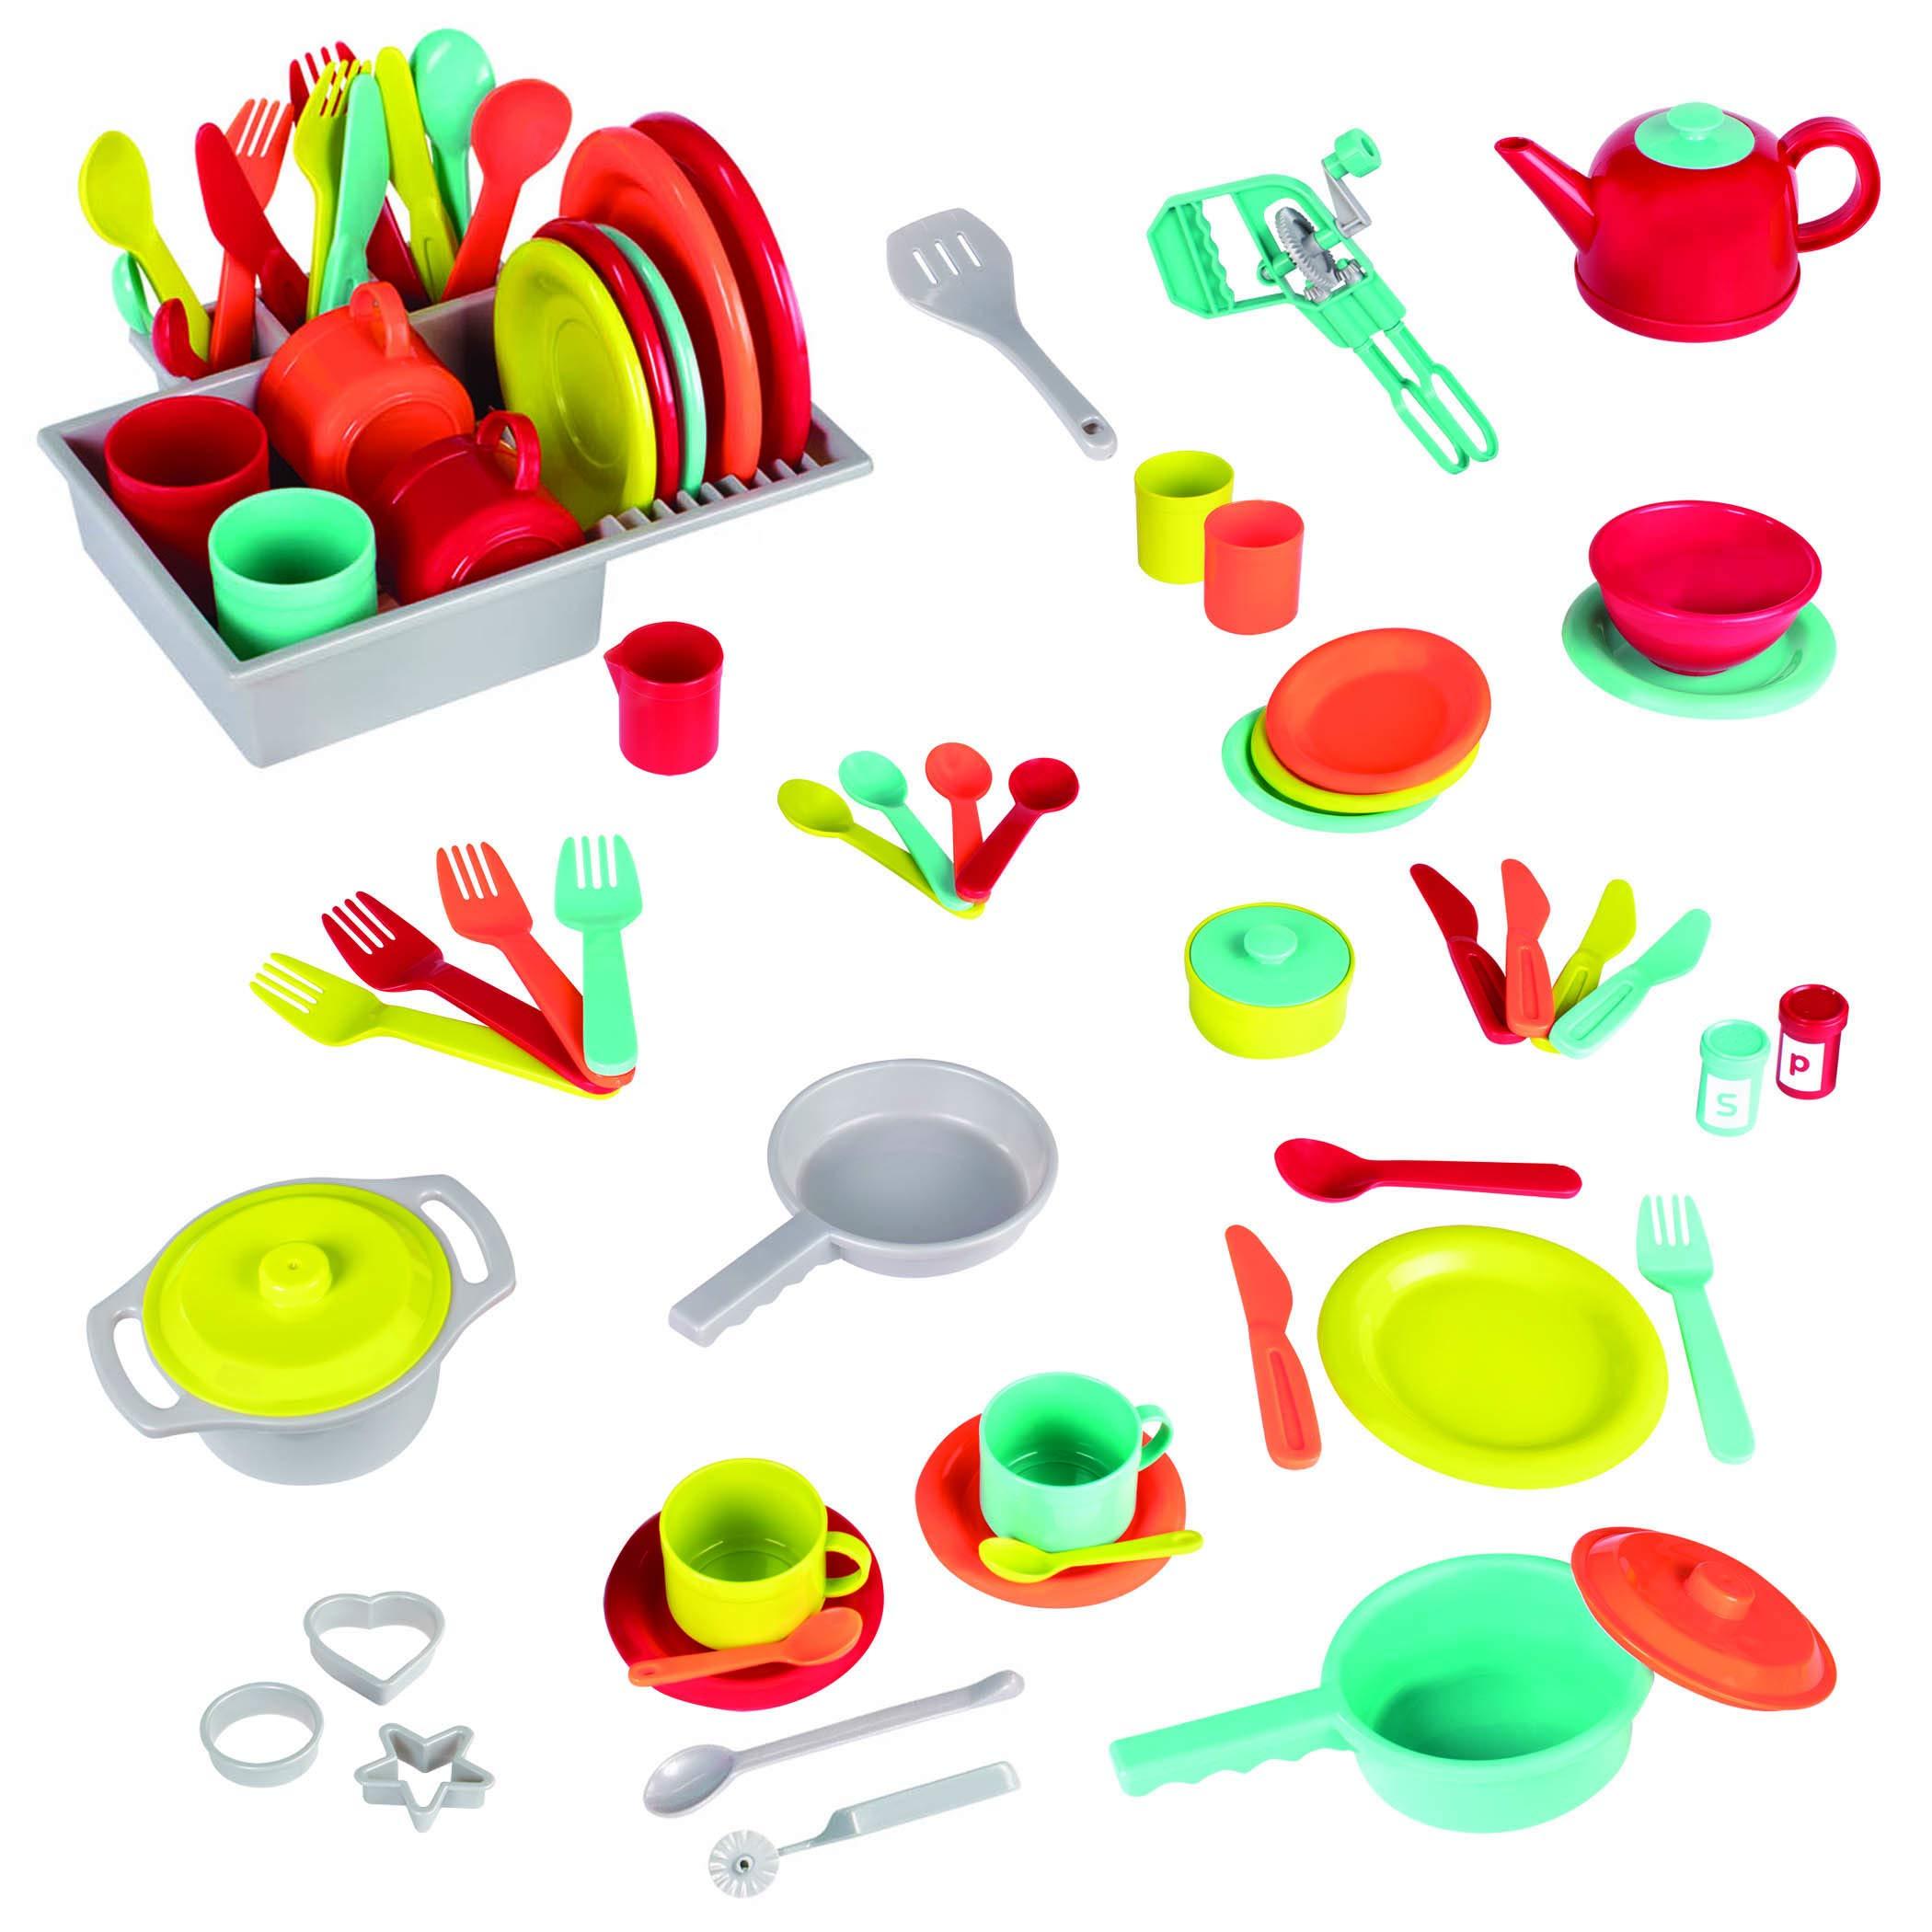 Battat - Deluxe Kitchen - Pretend Play Accessory Toy Set (71 Pieces Including Pots & Pans) by Battat